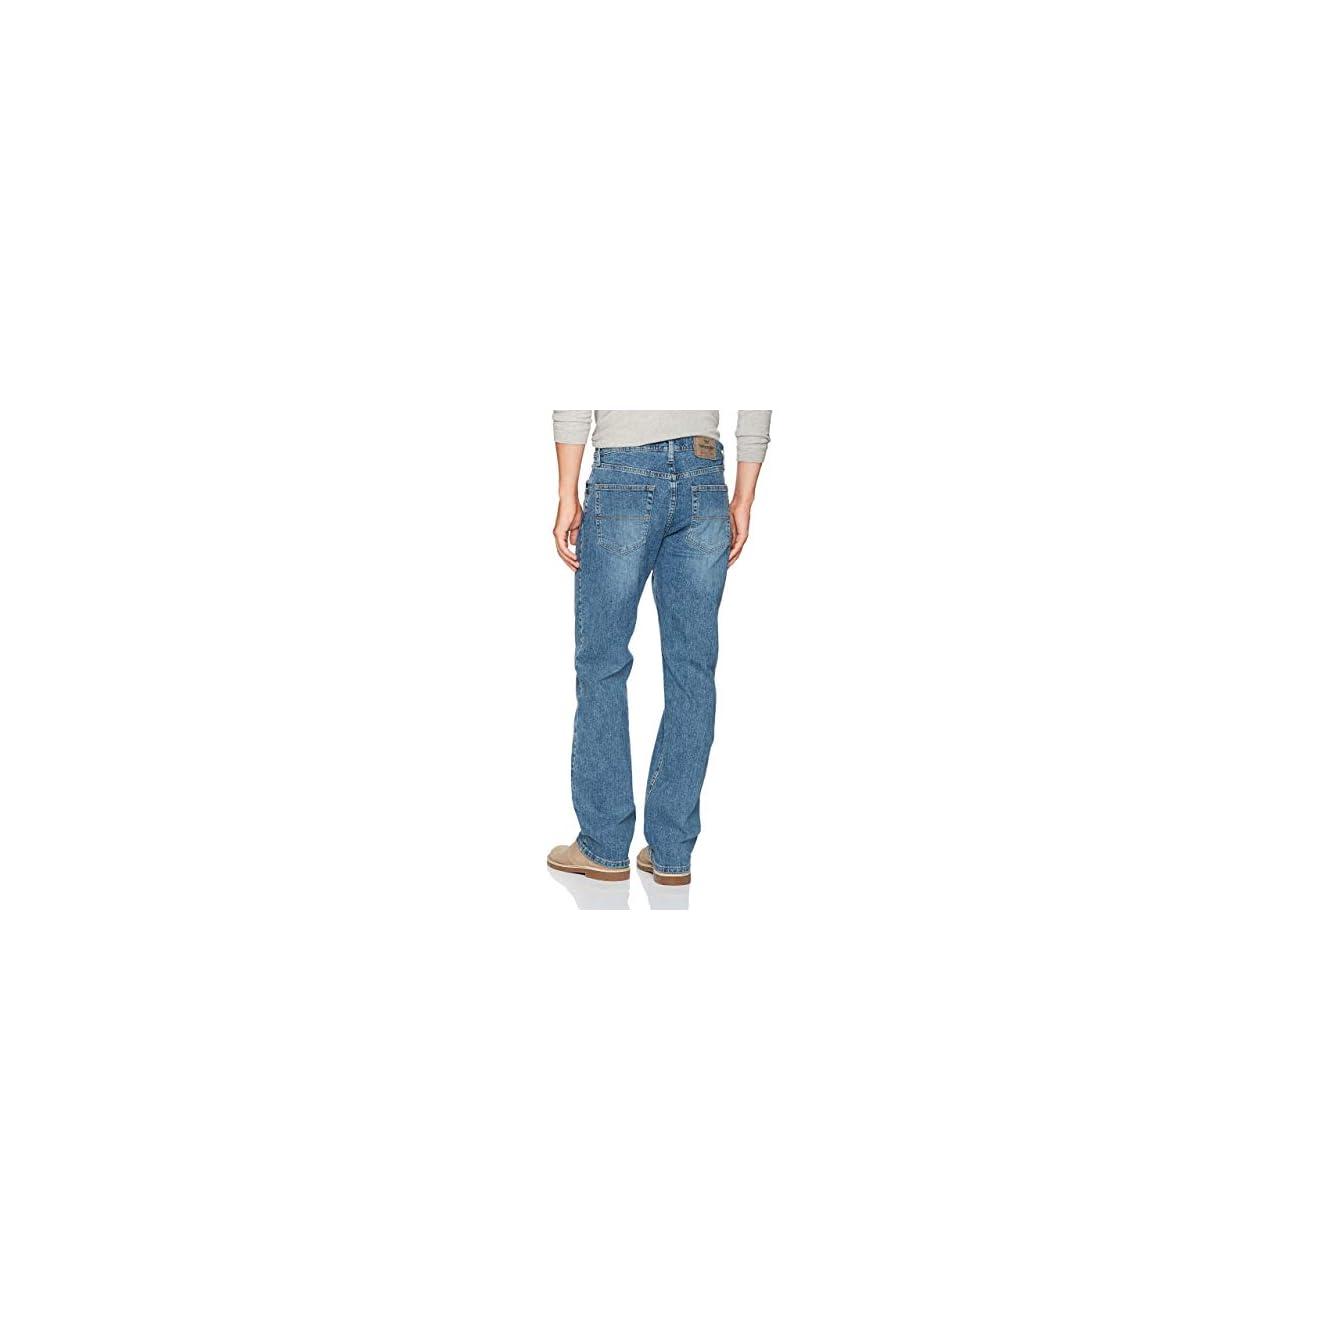 mens jeans on sale amazon